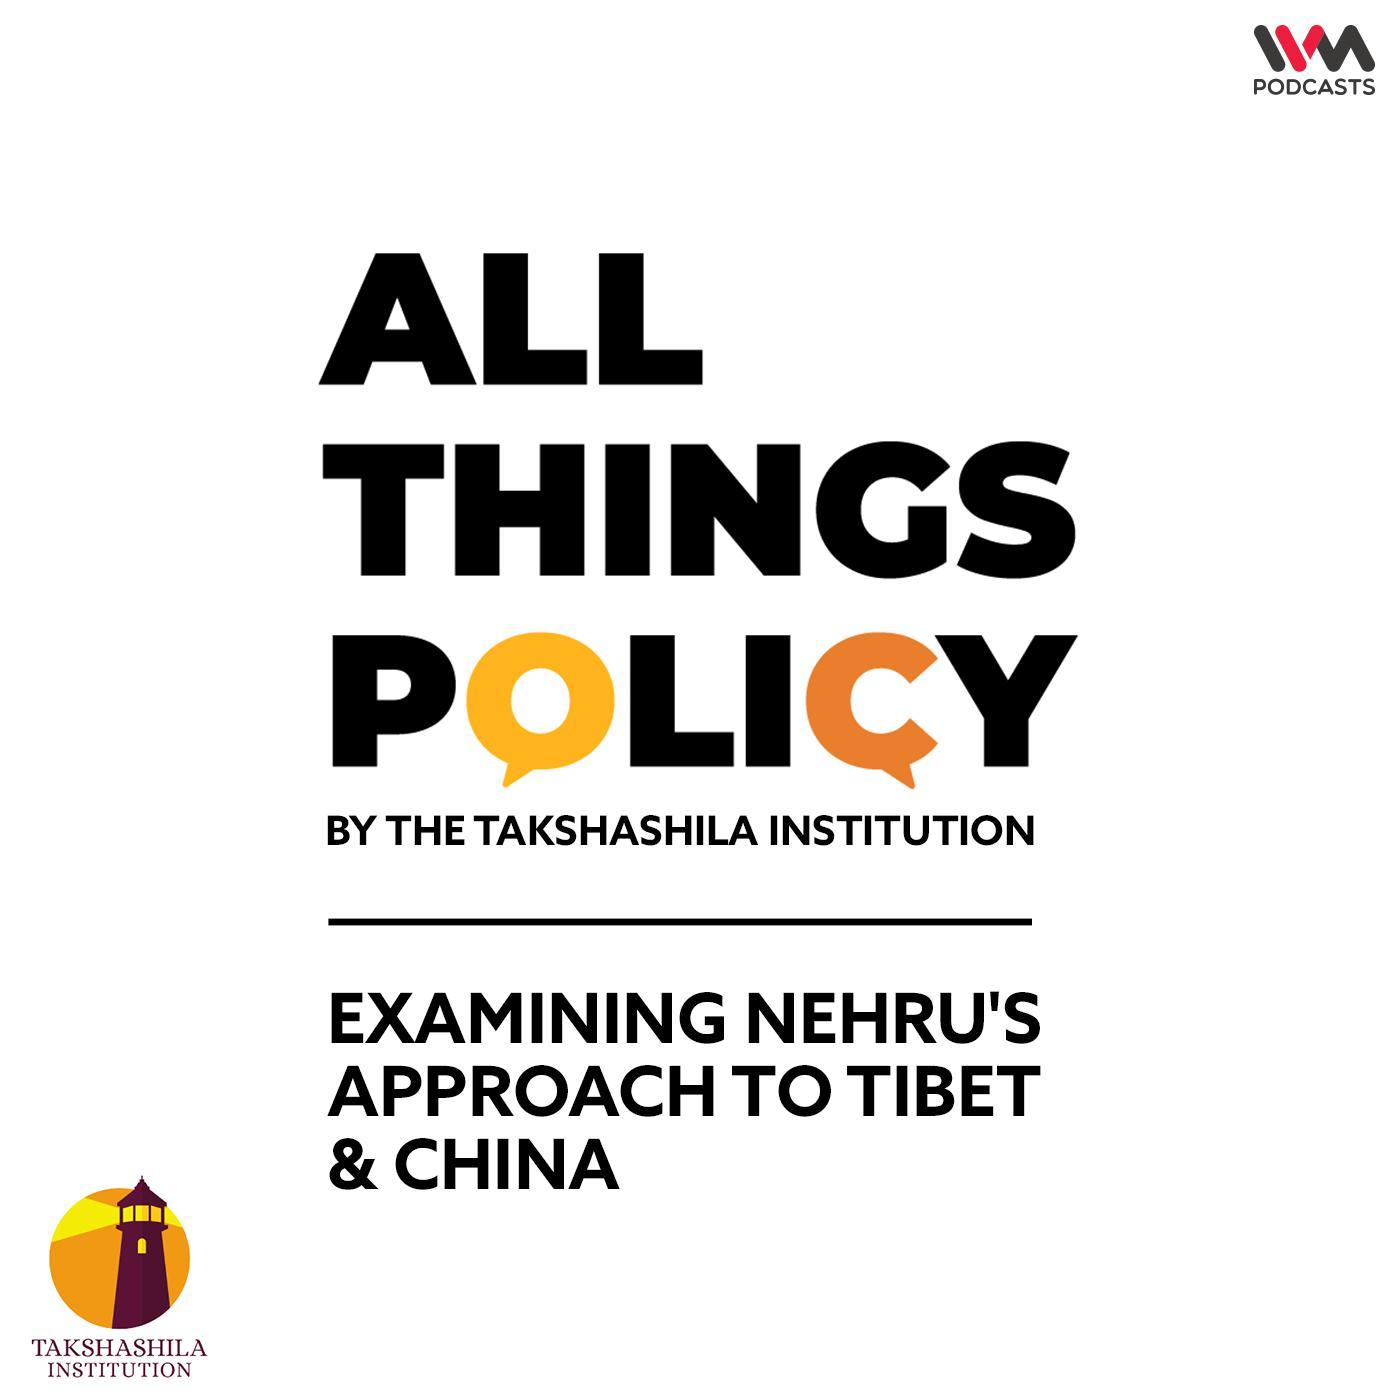 Ep. 589: Examining Nehru's Approach to Tibet & China